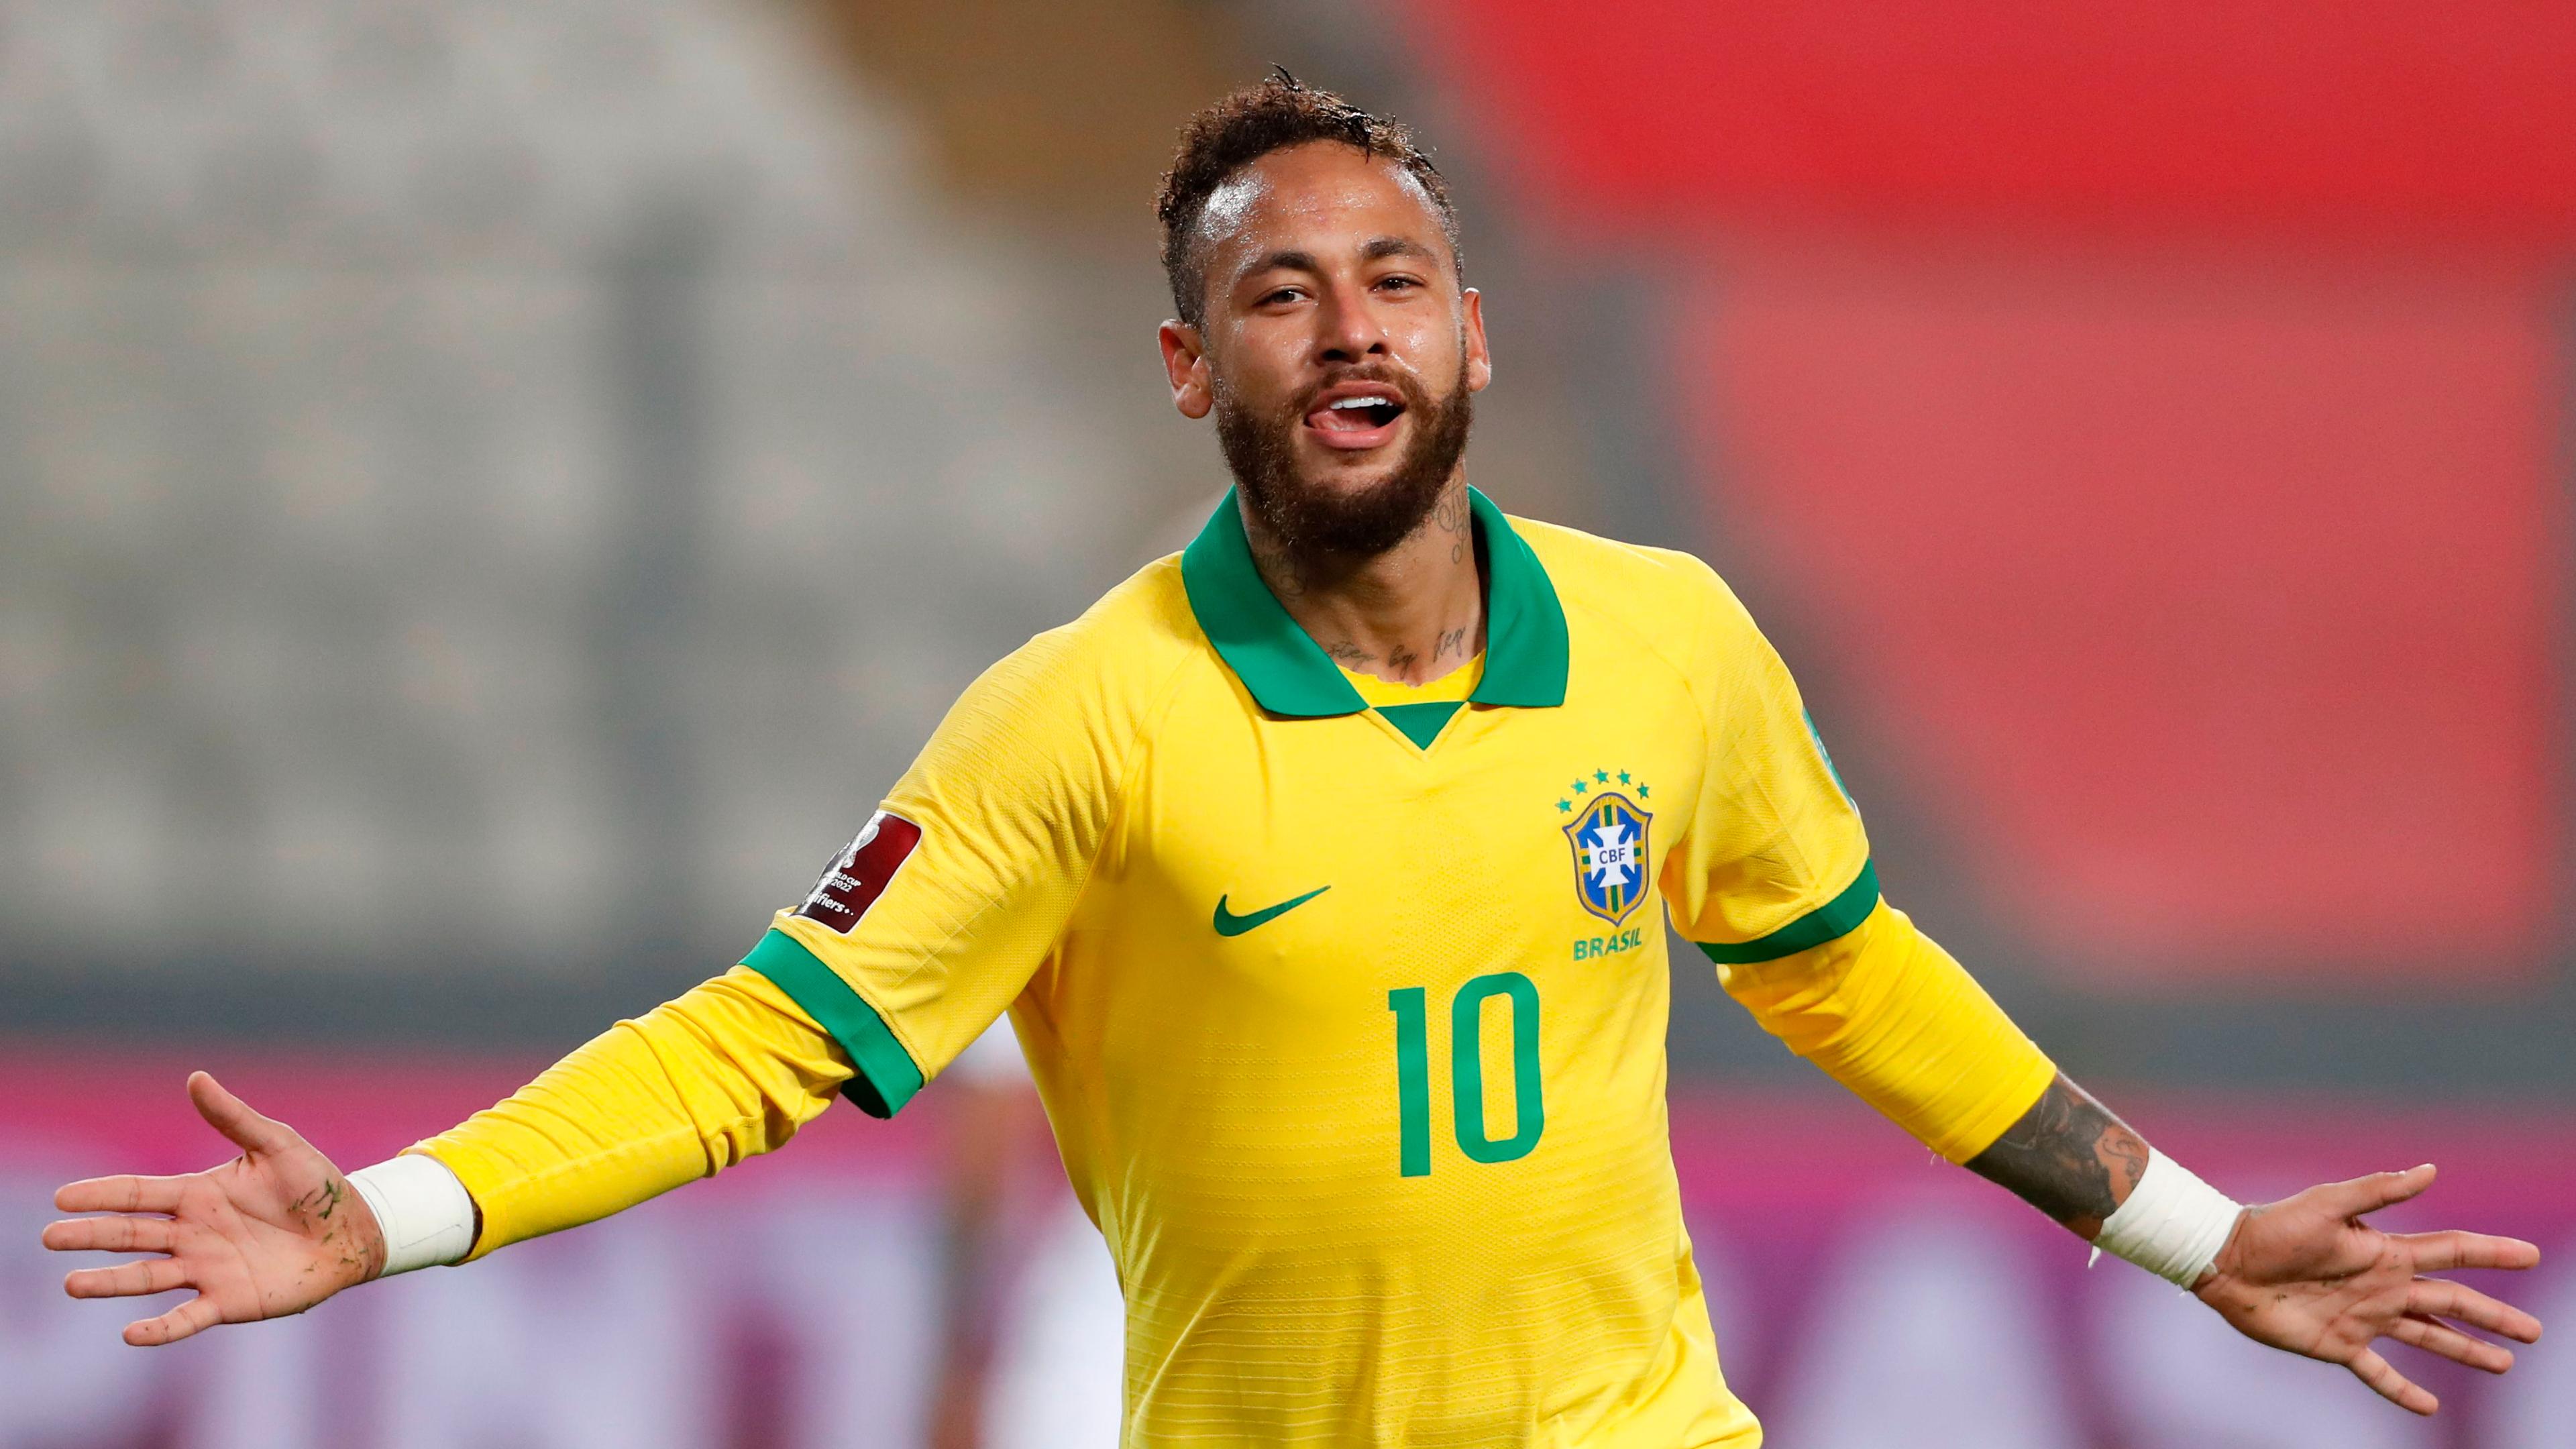 Neymar is a real clown!' - Zambrano slams Brazil star for diving in Peru  clash   Goal.com